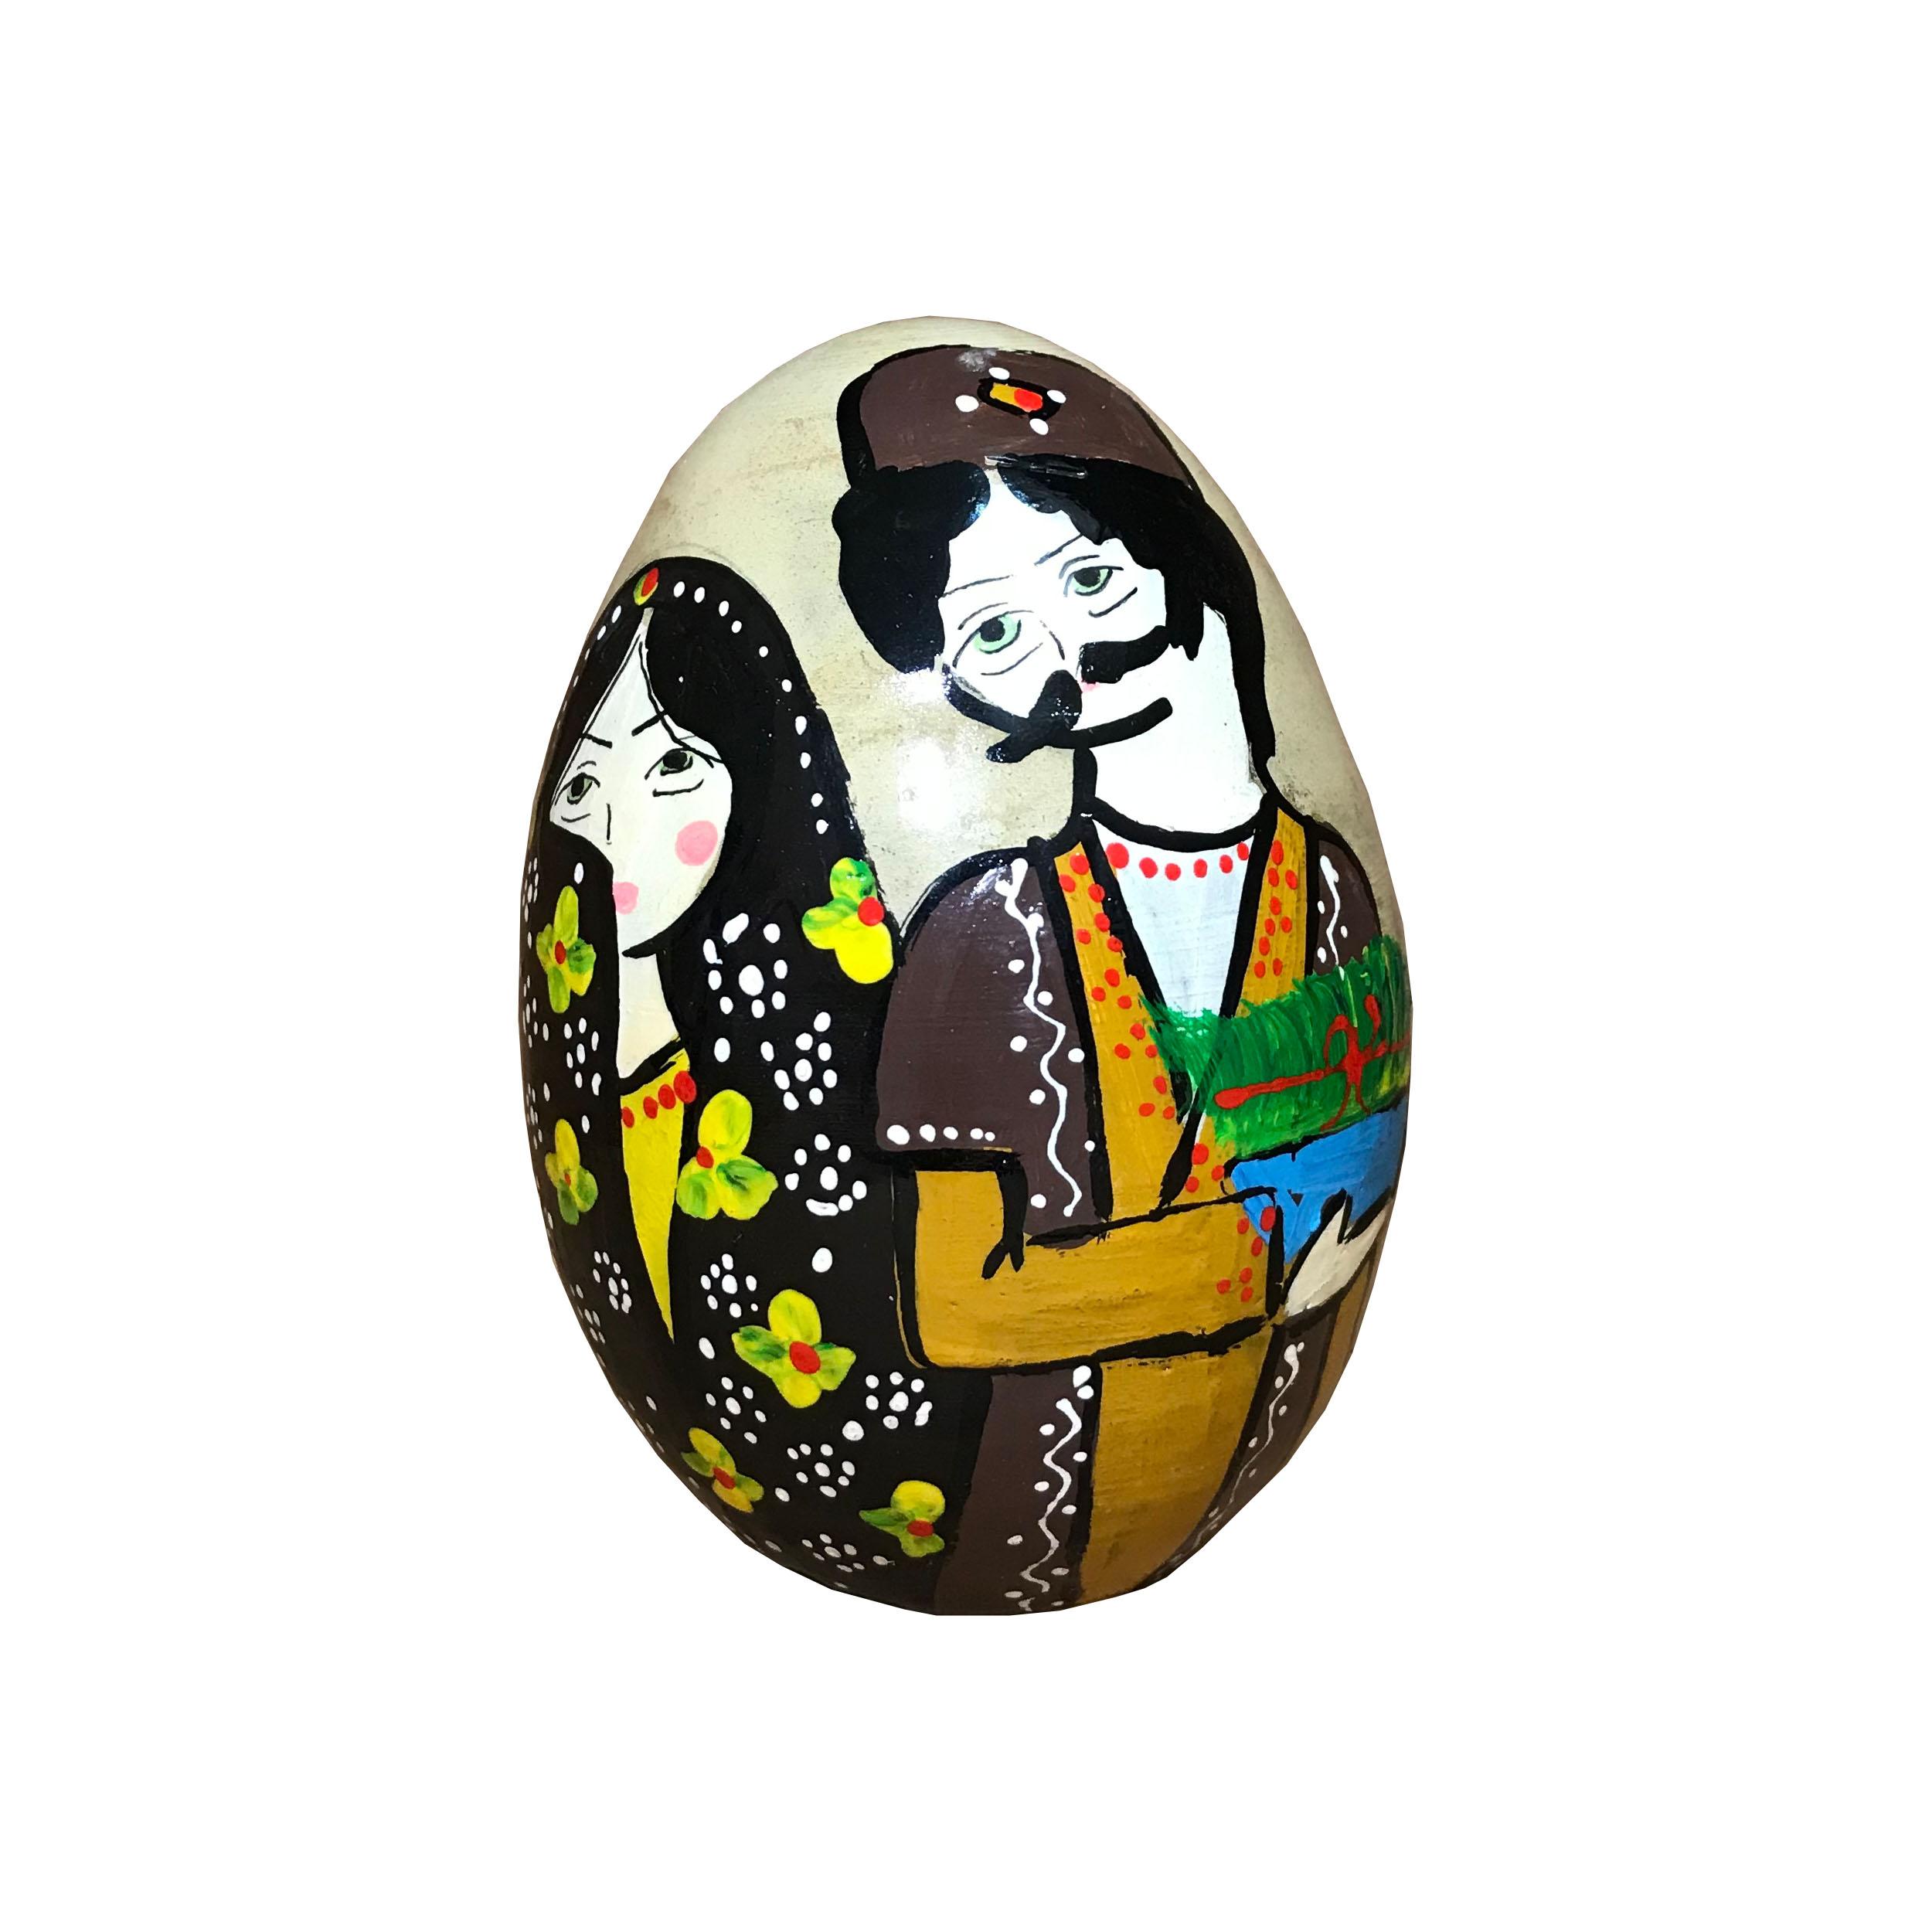 تخم مرغ تزیینی مدل نوروز کد N03